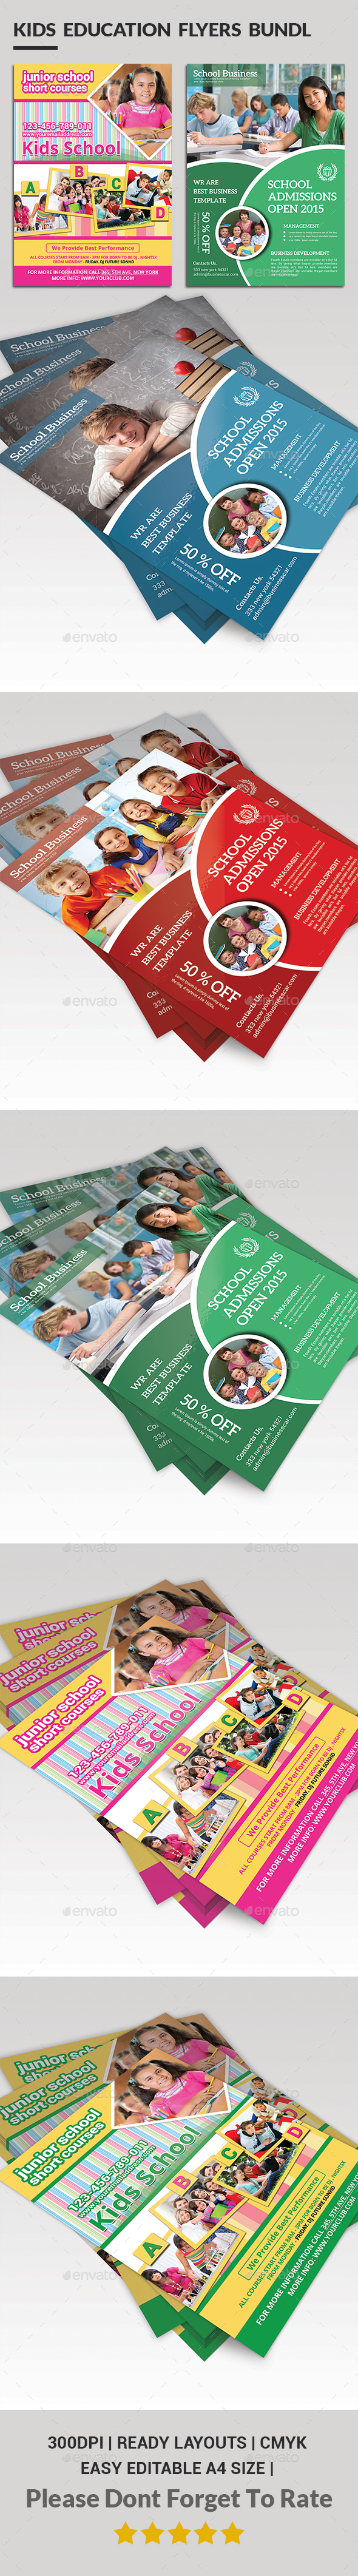 School Education Flyer Bundle - Corporate Flyers